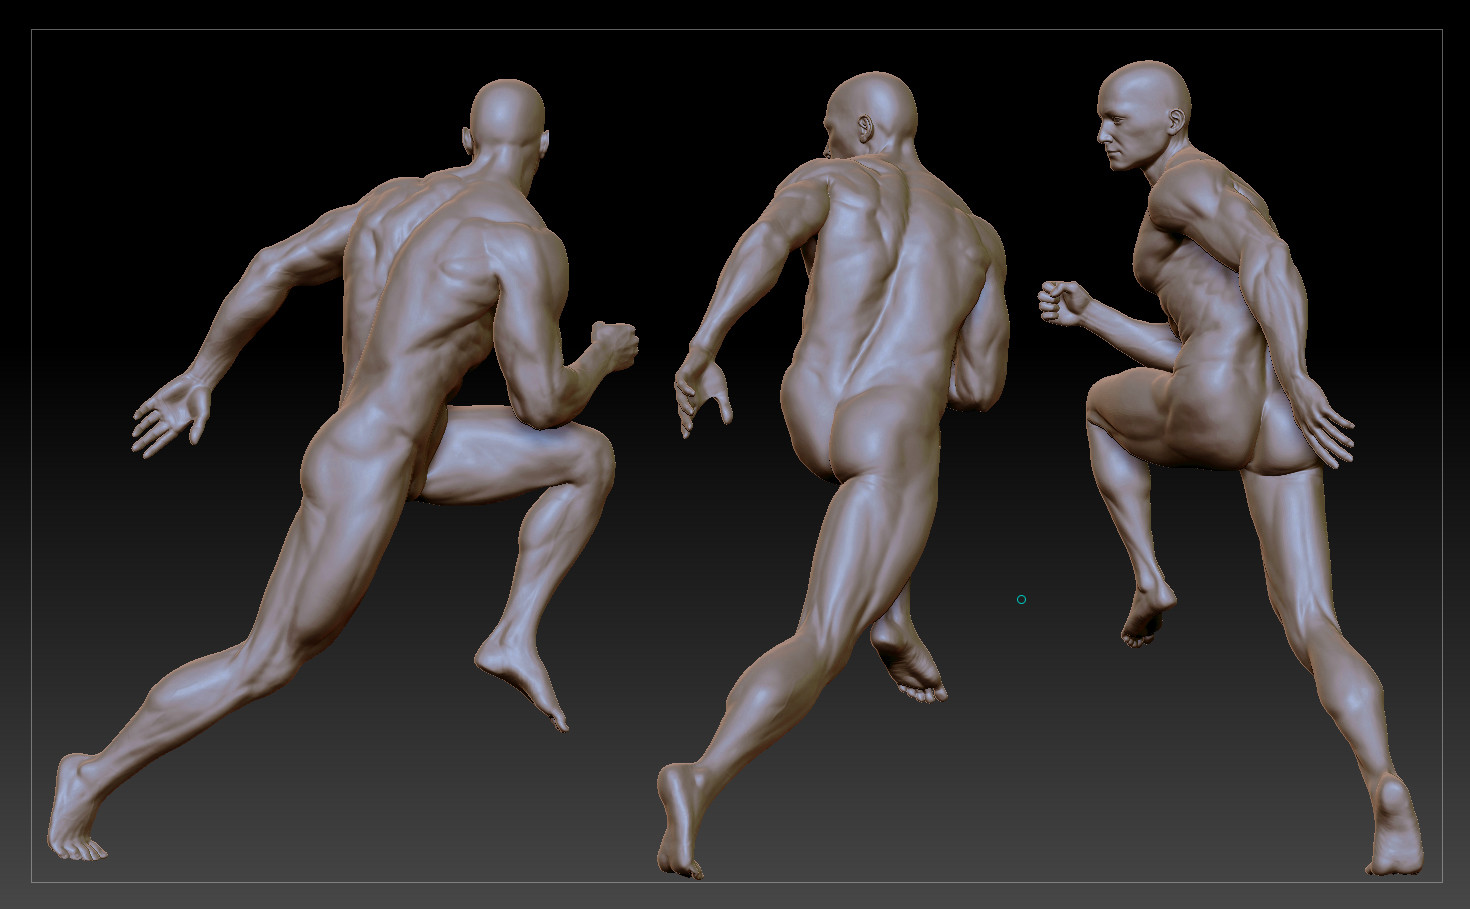 Abhinandan Ghosh - Male Anatomy in Motion